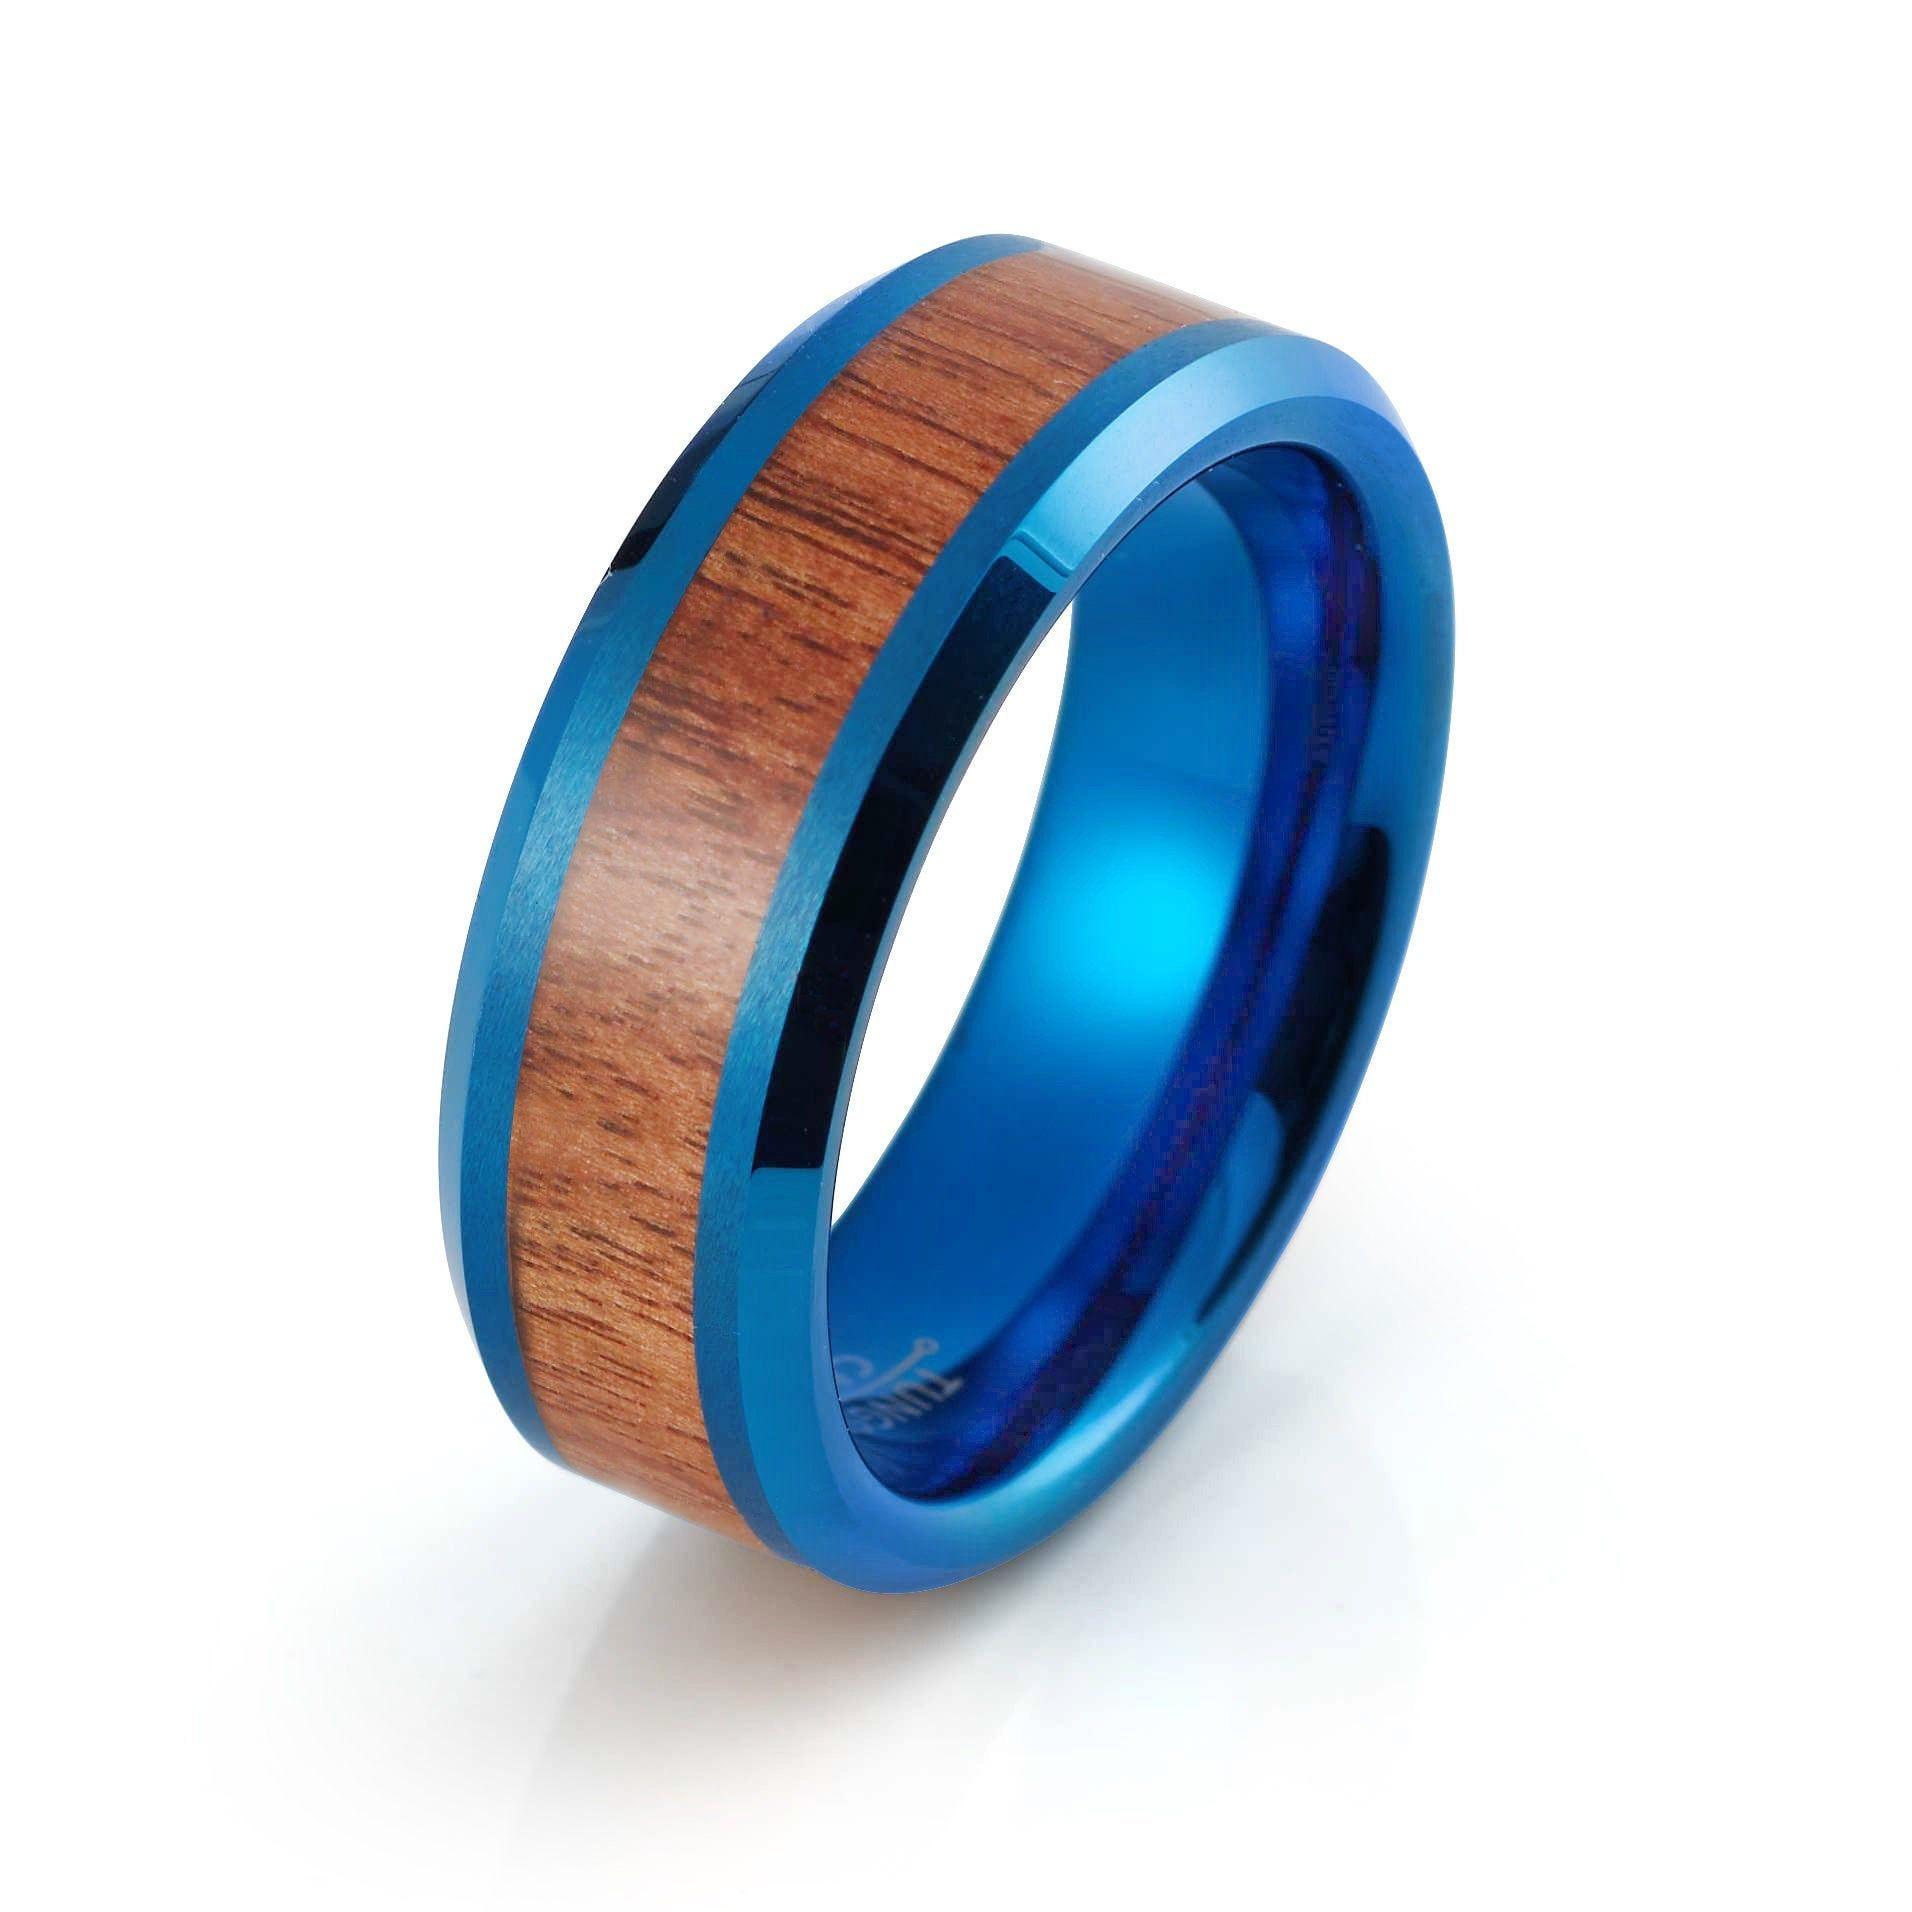 Koa Wood Ring Tungsten Wedding Band Mens Blue Ring 8mm Engagement Anniversary Koa Wood Wedding Band Blue Wood Ring Tungsten Blue